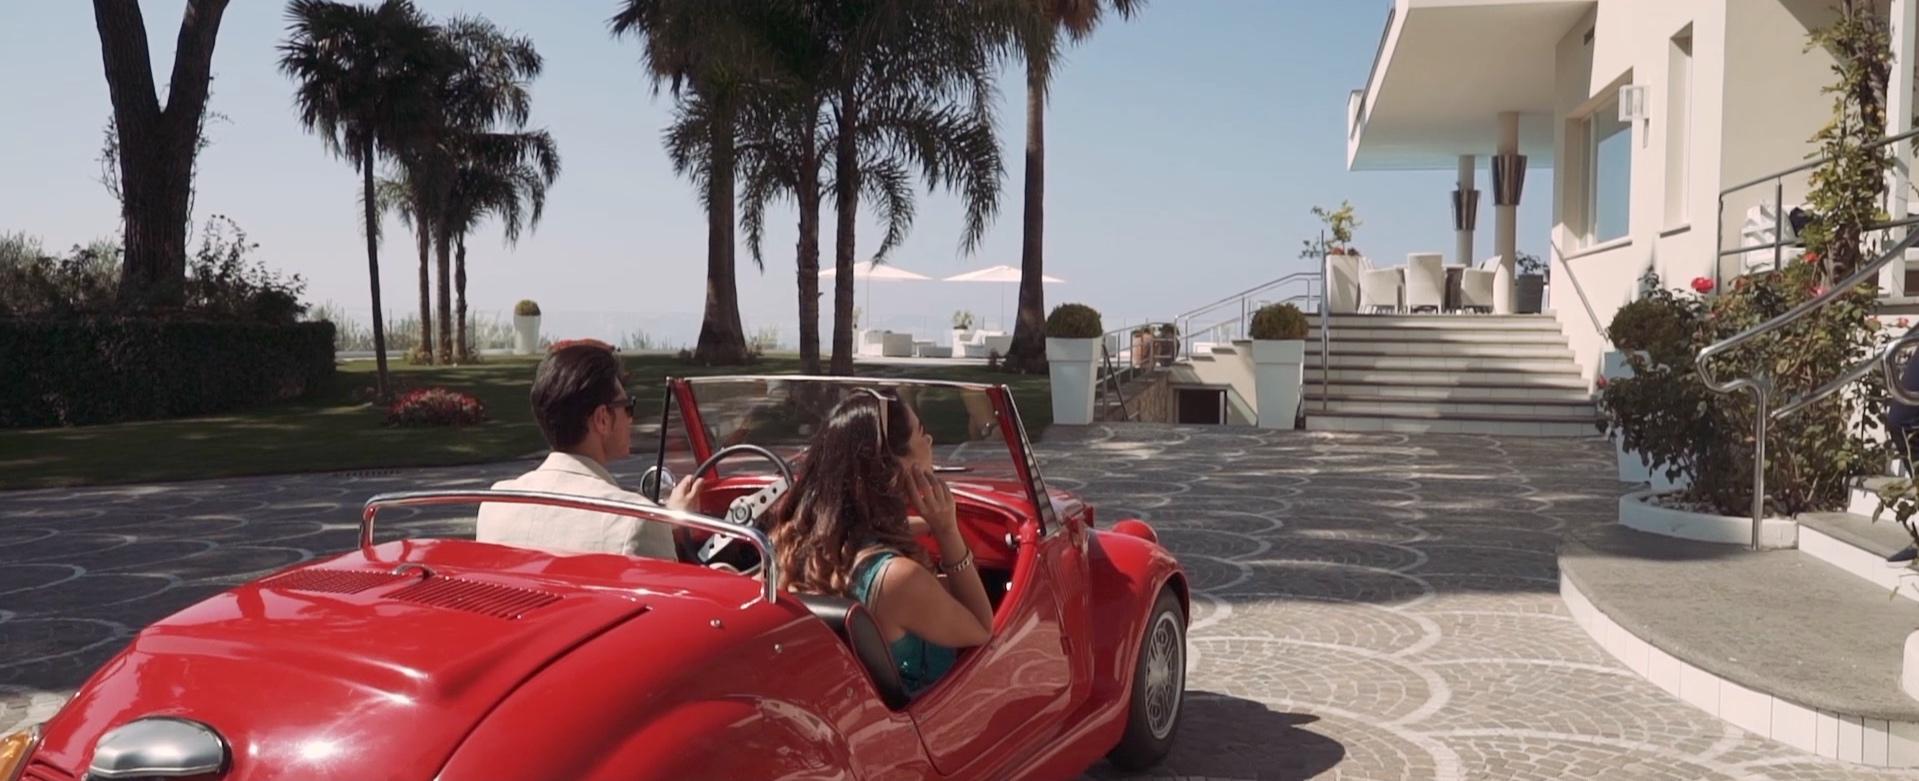 Villa Eliana - #emotionalvideo